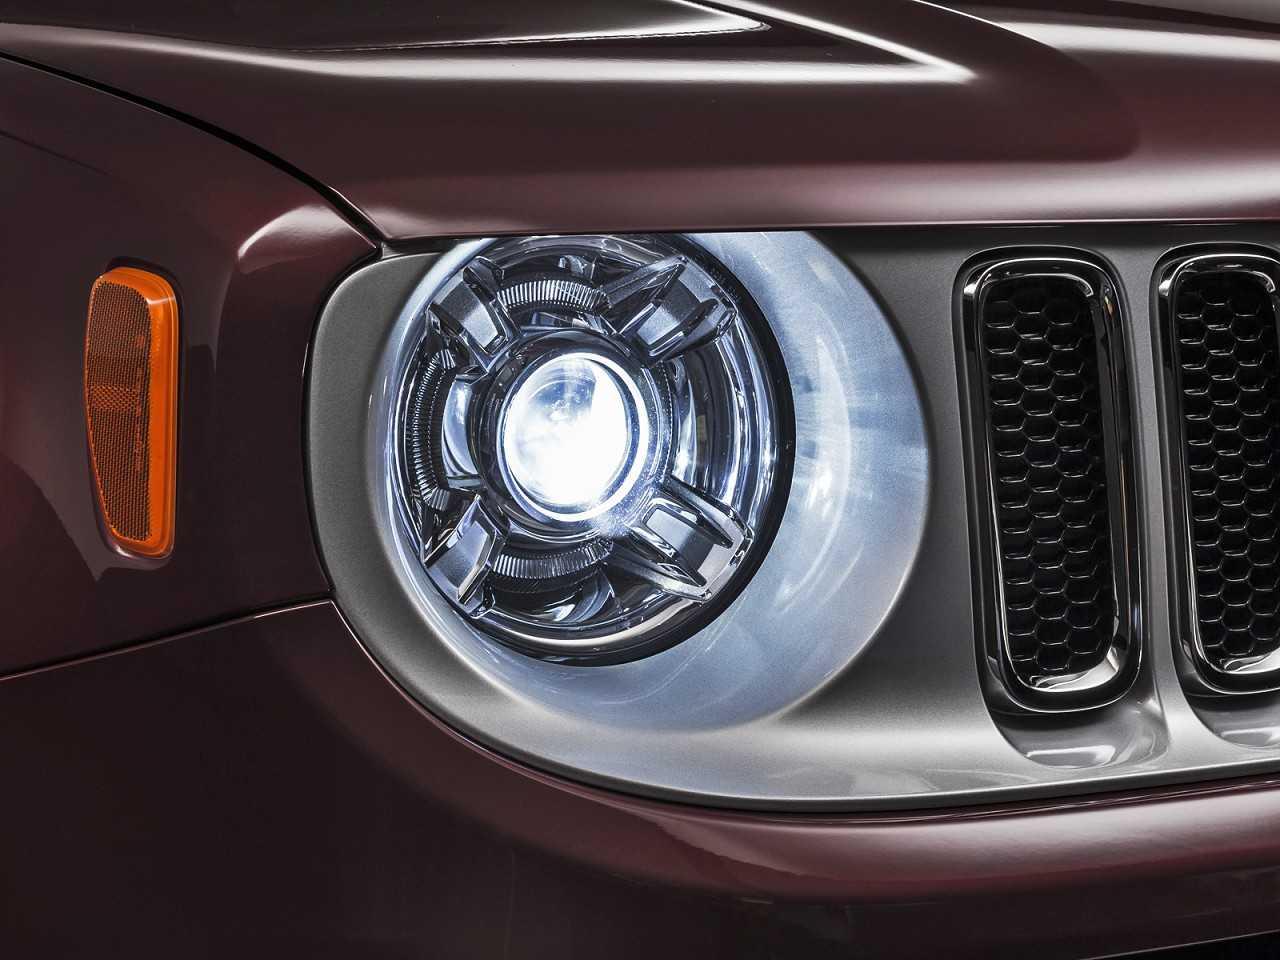 JeepRenegade 2017 - faróis